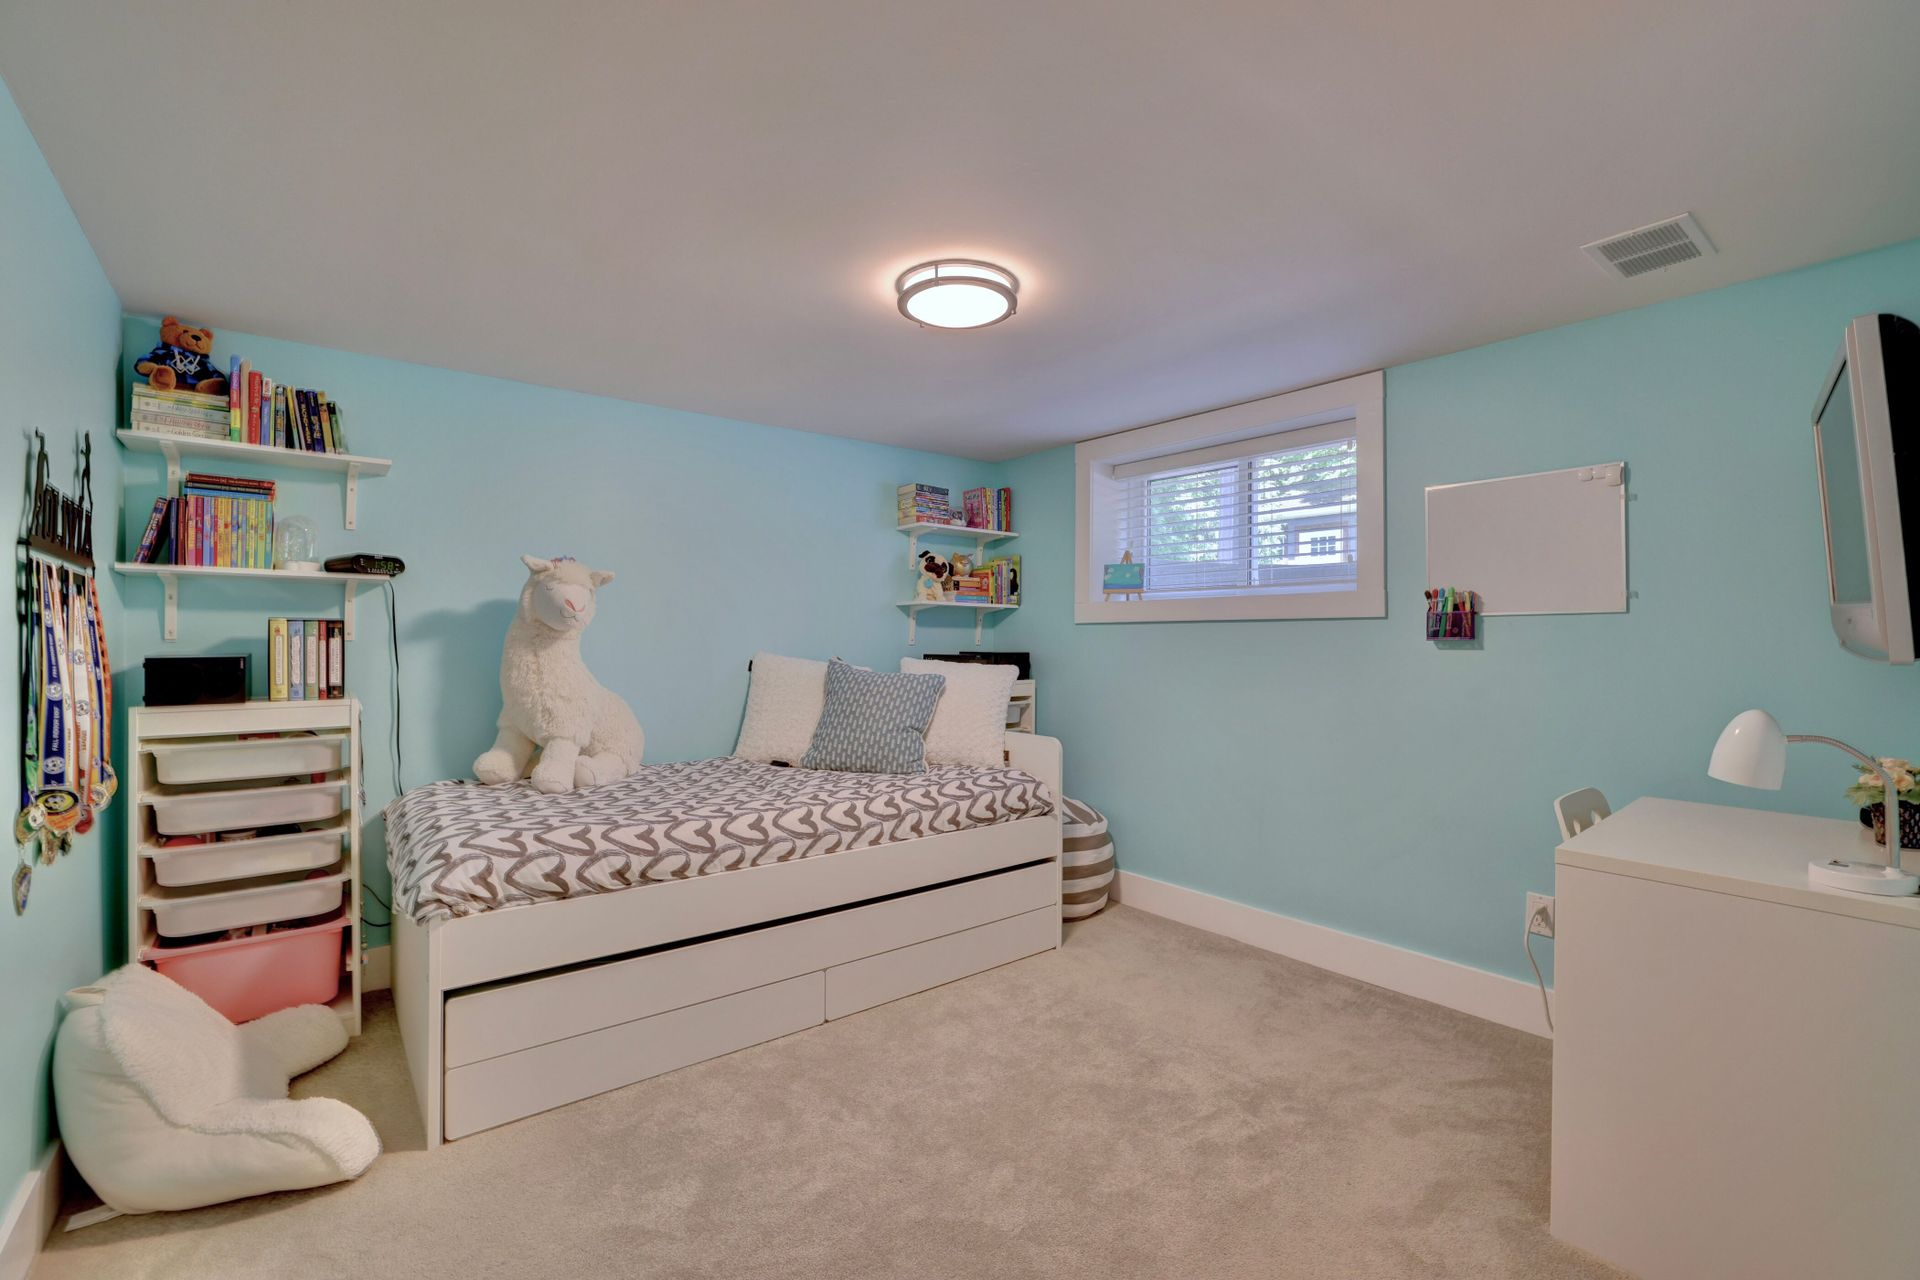 249-lakeview-ave-burlington-bedroom-4 at 249 Lakeview Ave, Burlington,